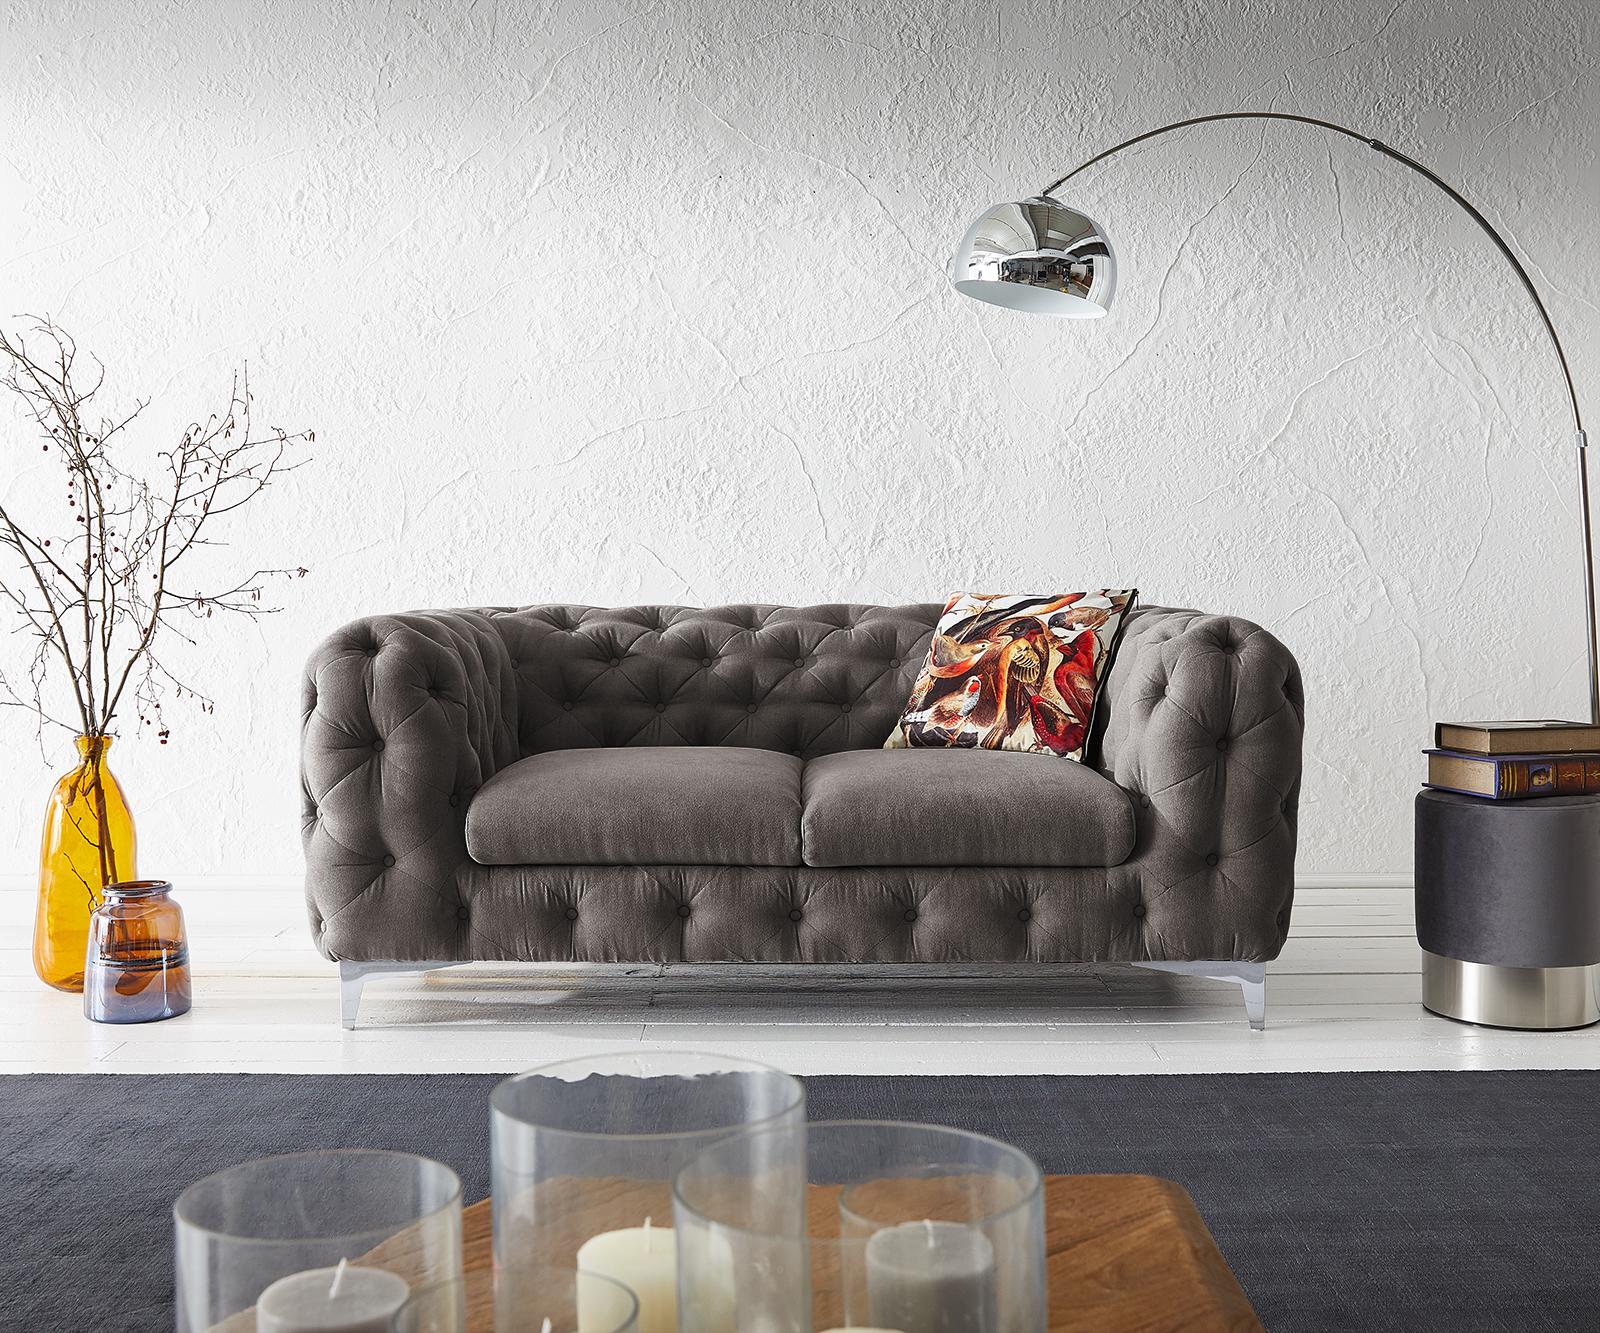 Couch Corleone 185x97 cm Khakibraun 2-Sitzer Sofa